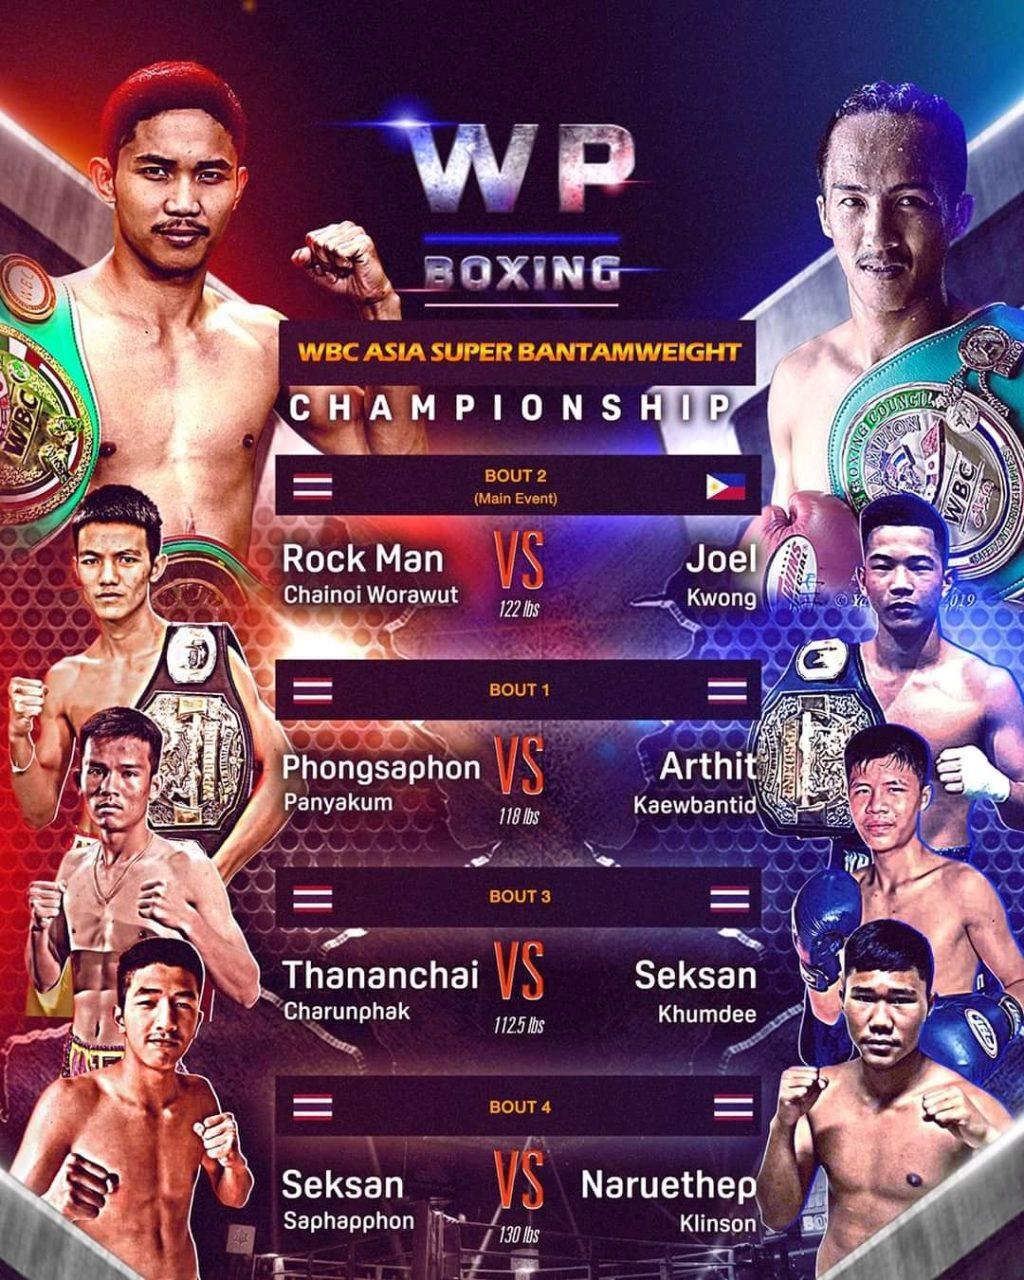 """ROCK MAN"" Chainoi Worawut faces Filipino Foe, Joel Kwong, on Saturday in Thailand"